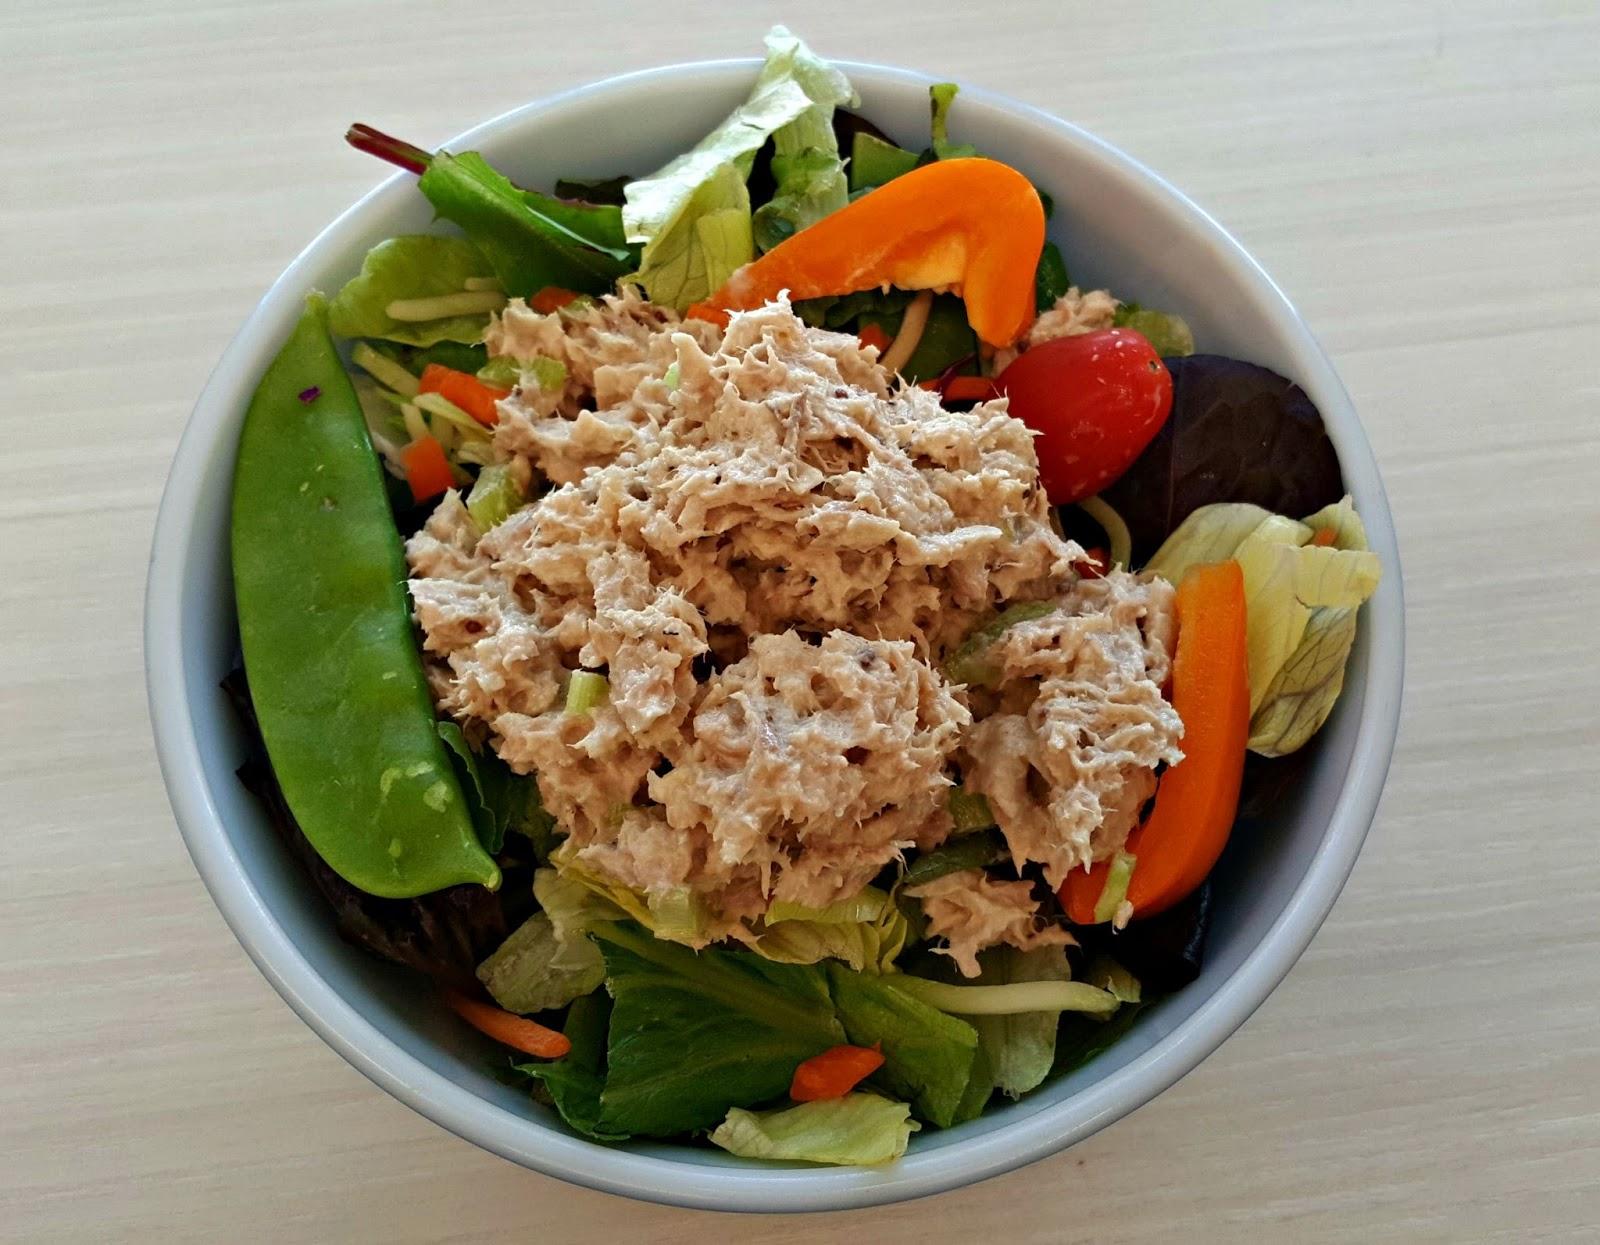 Mami-Eggroll: Garden salad topped with Tuna Fish salad